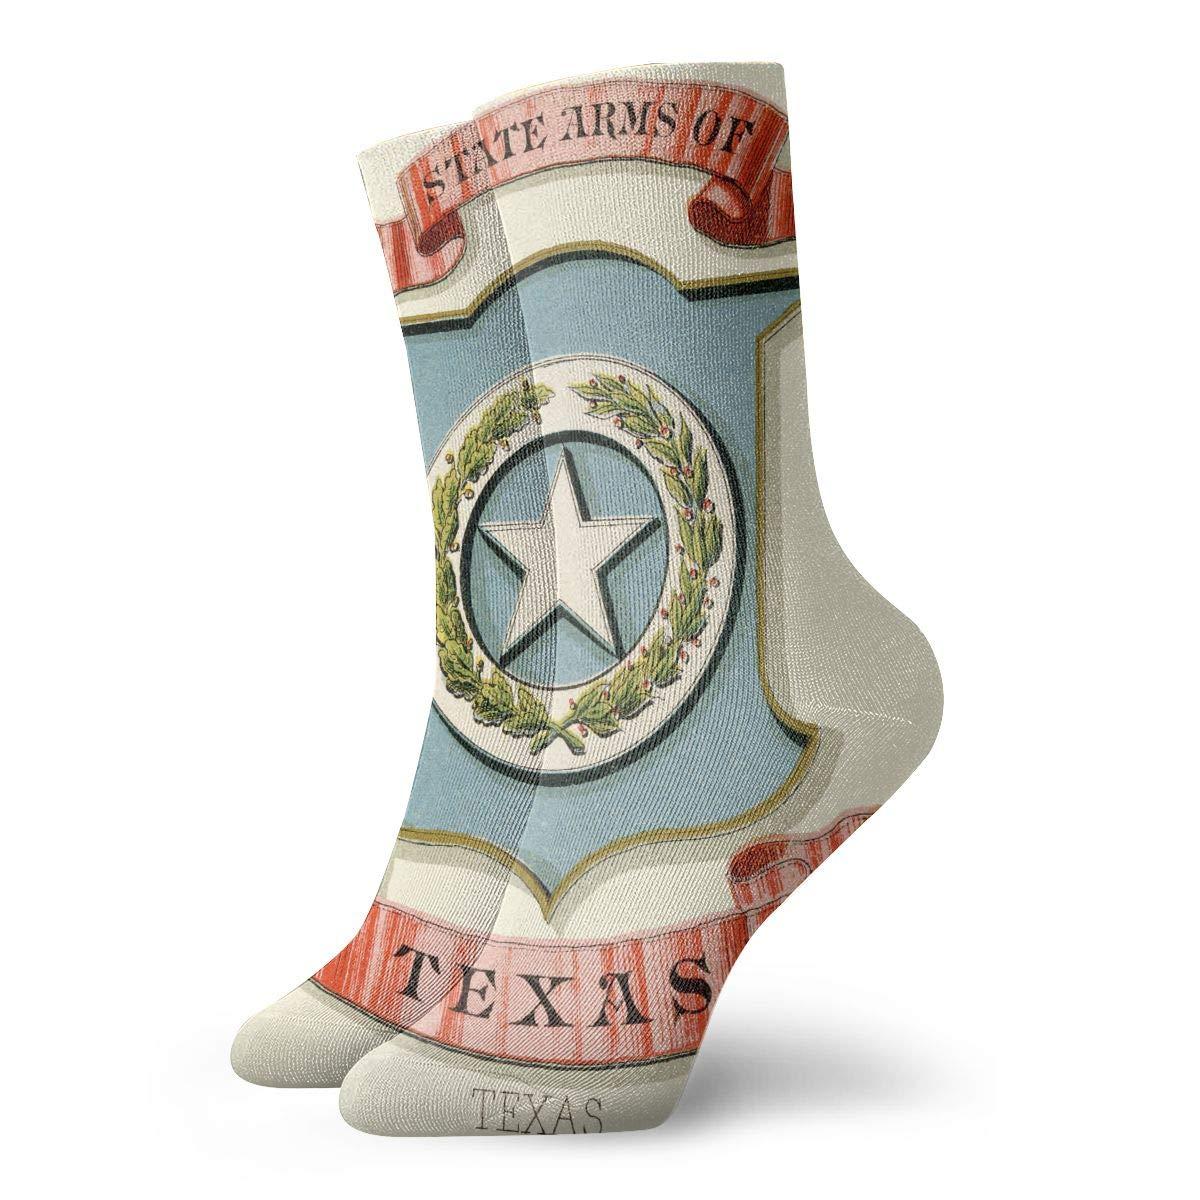 Texas State Coat Of Arms Fashion Dress Socks Short Socks Leisure Travel 11.8 Inch